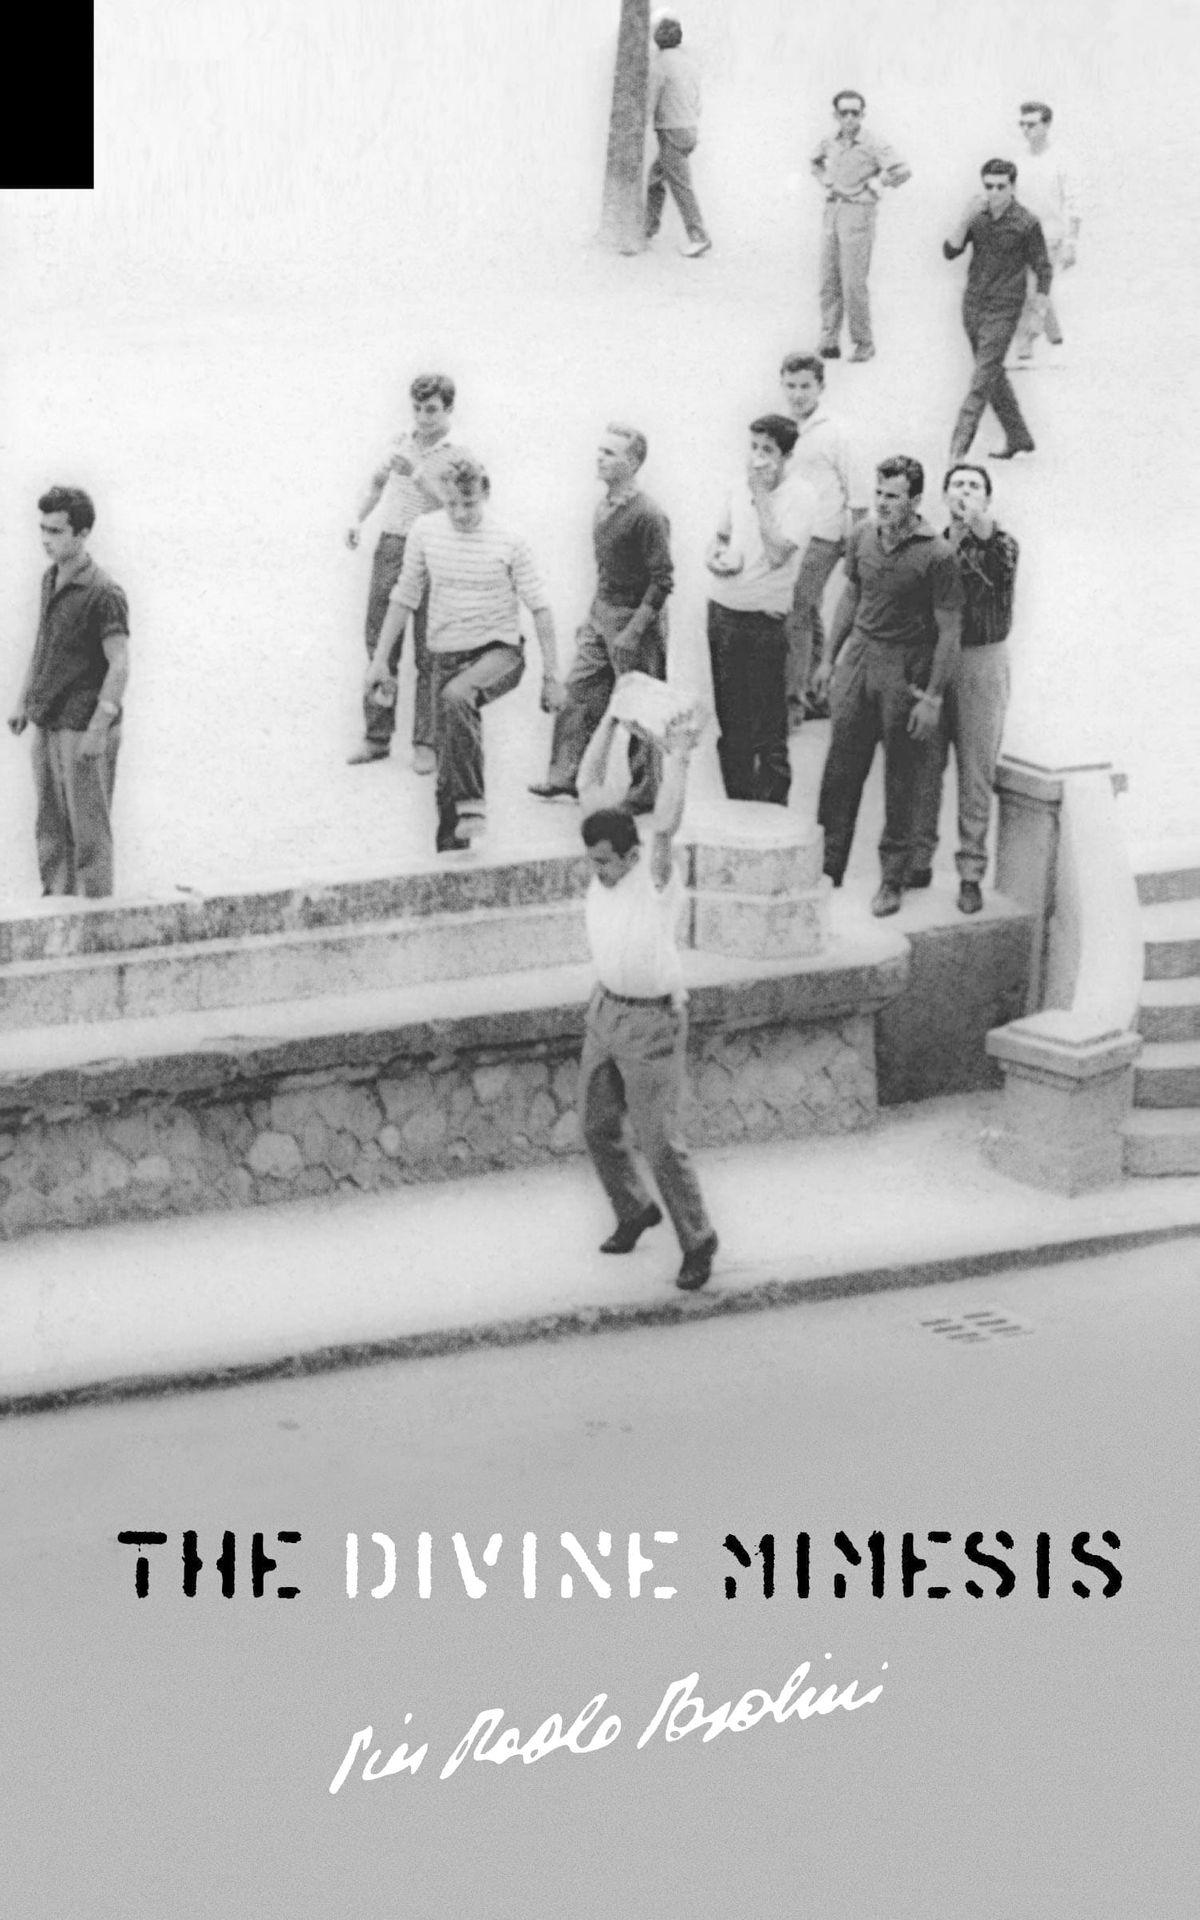 The Divine Mimesis